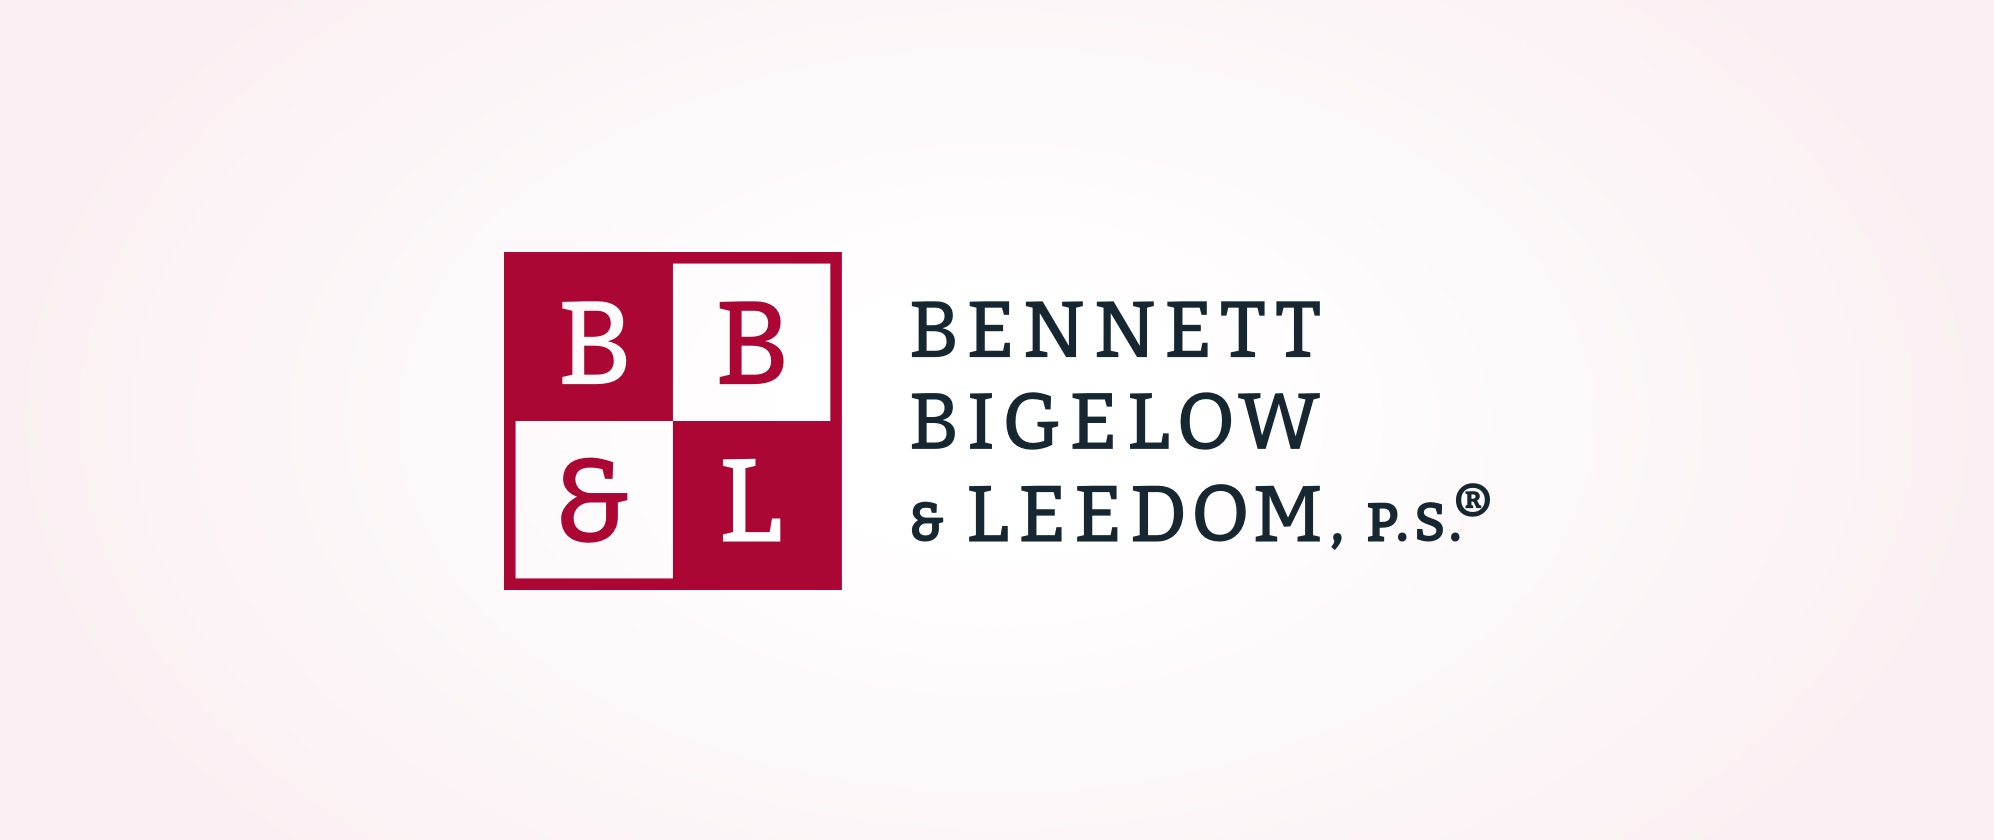 Case Study: Bennett Bigelow & Leedom